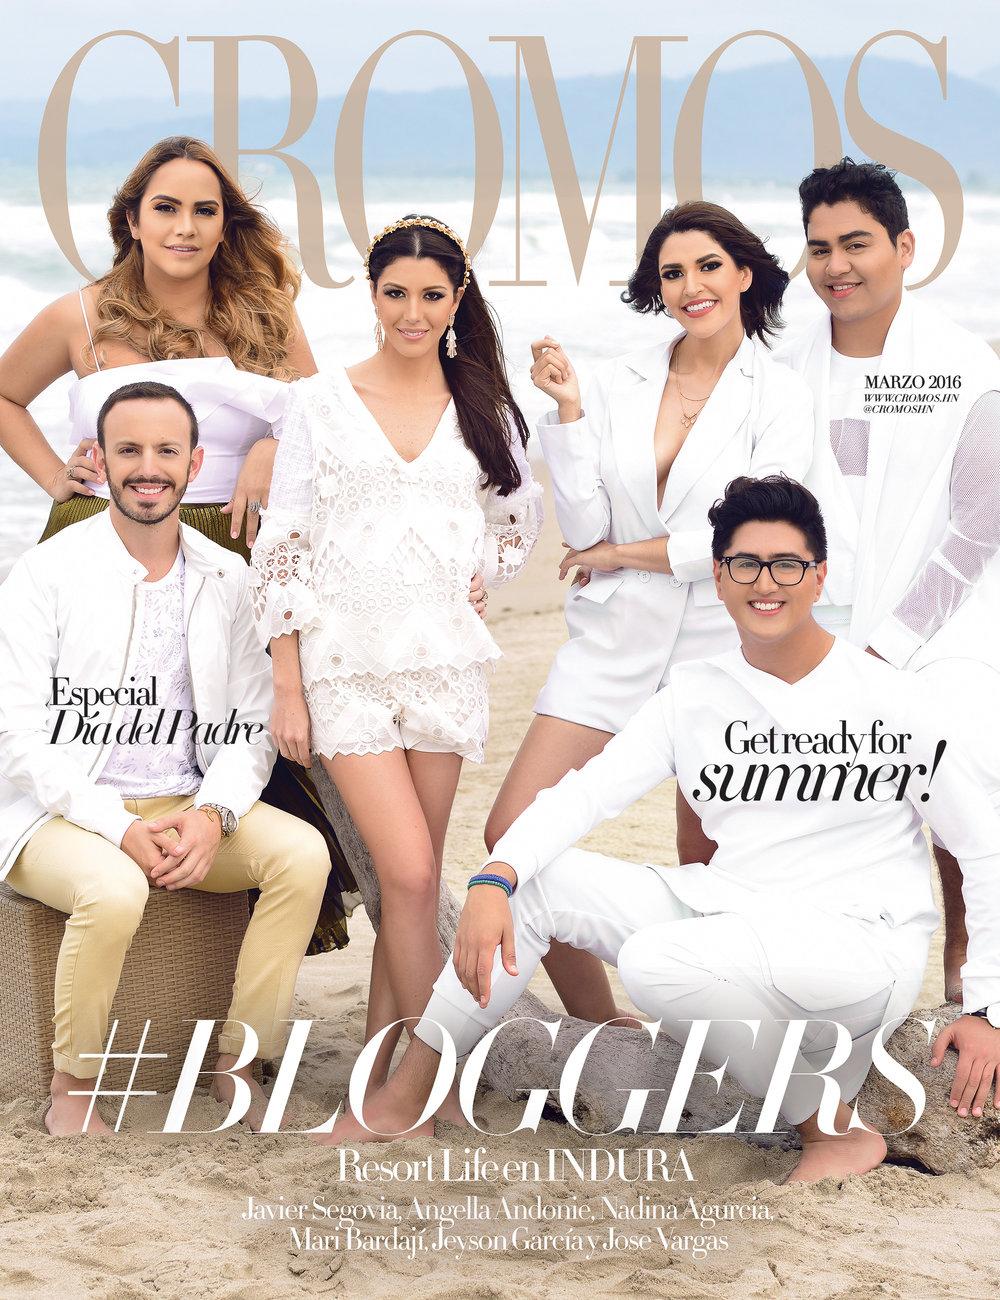 Bloggers Portada.jpg